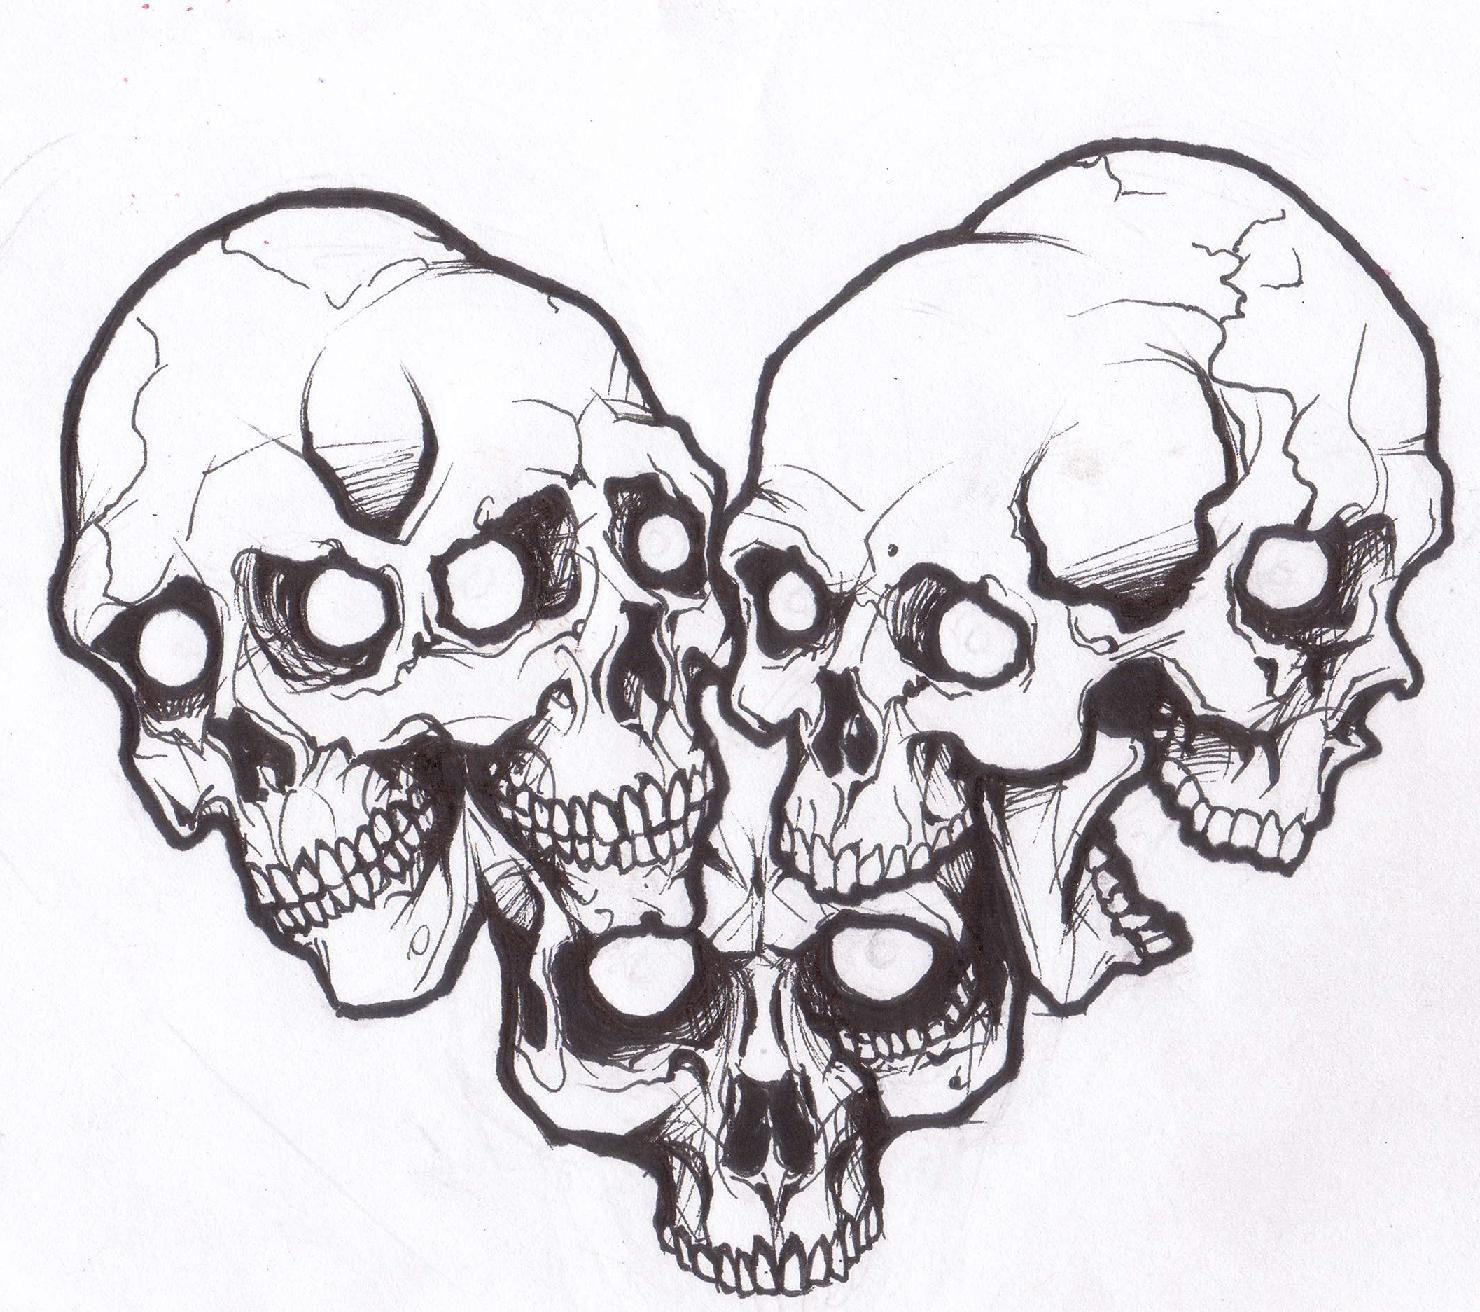 Image detail for Skull Love Tattoo Design by Demonology